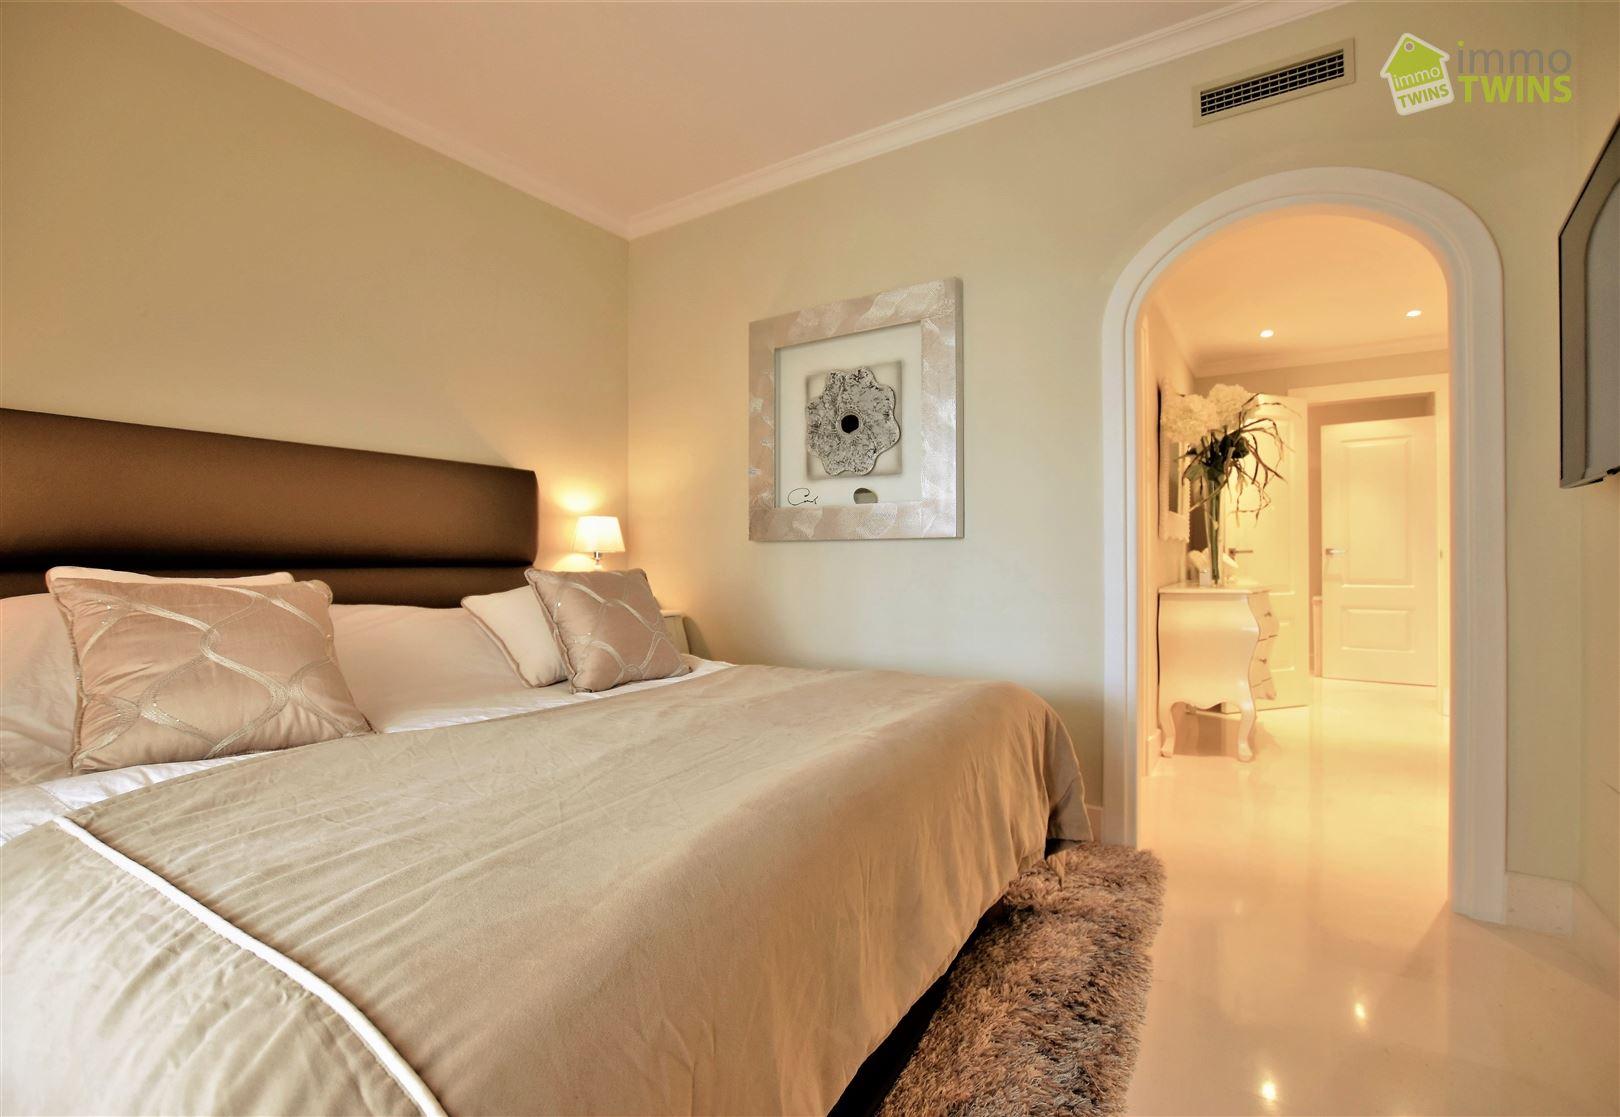 Foto 18 : Appartement te 29679 MARBELLA (Spanje) - Prijs € 485.000